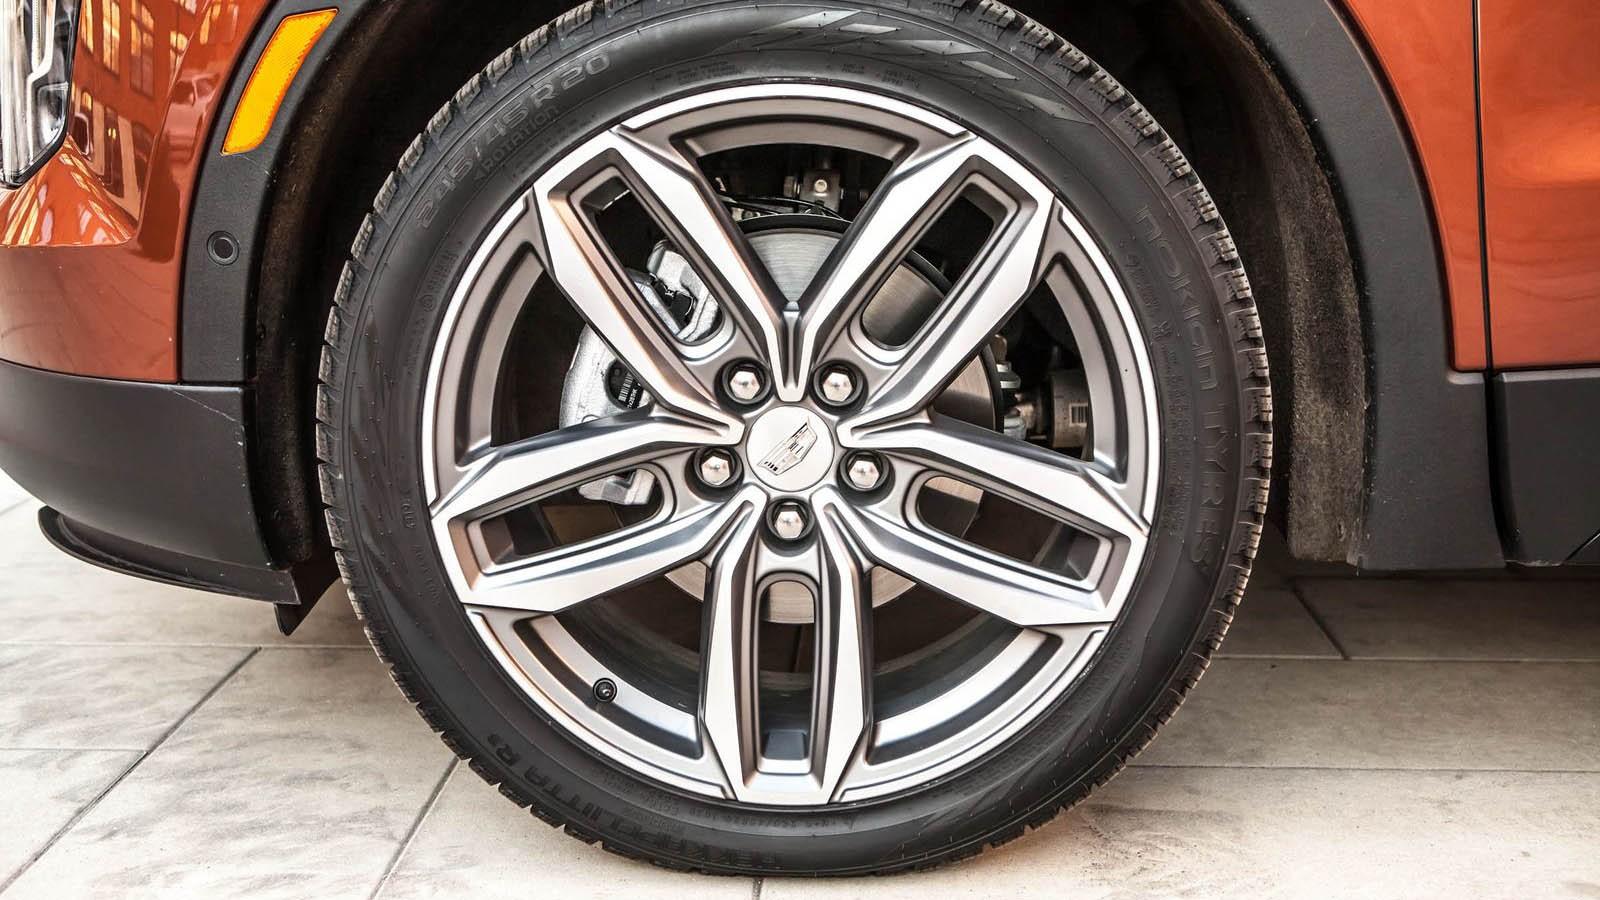 На базе Opel Insignia, мотор – с завода Opel. Это и есть Opel? Экспресс-тест Cadillac XT4